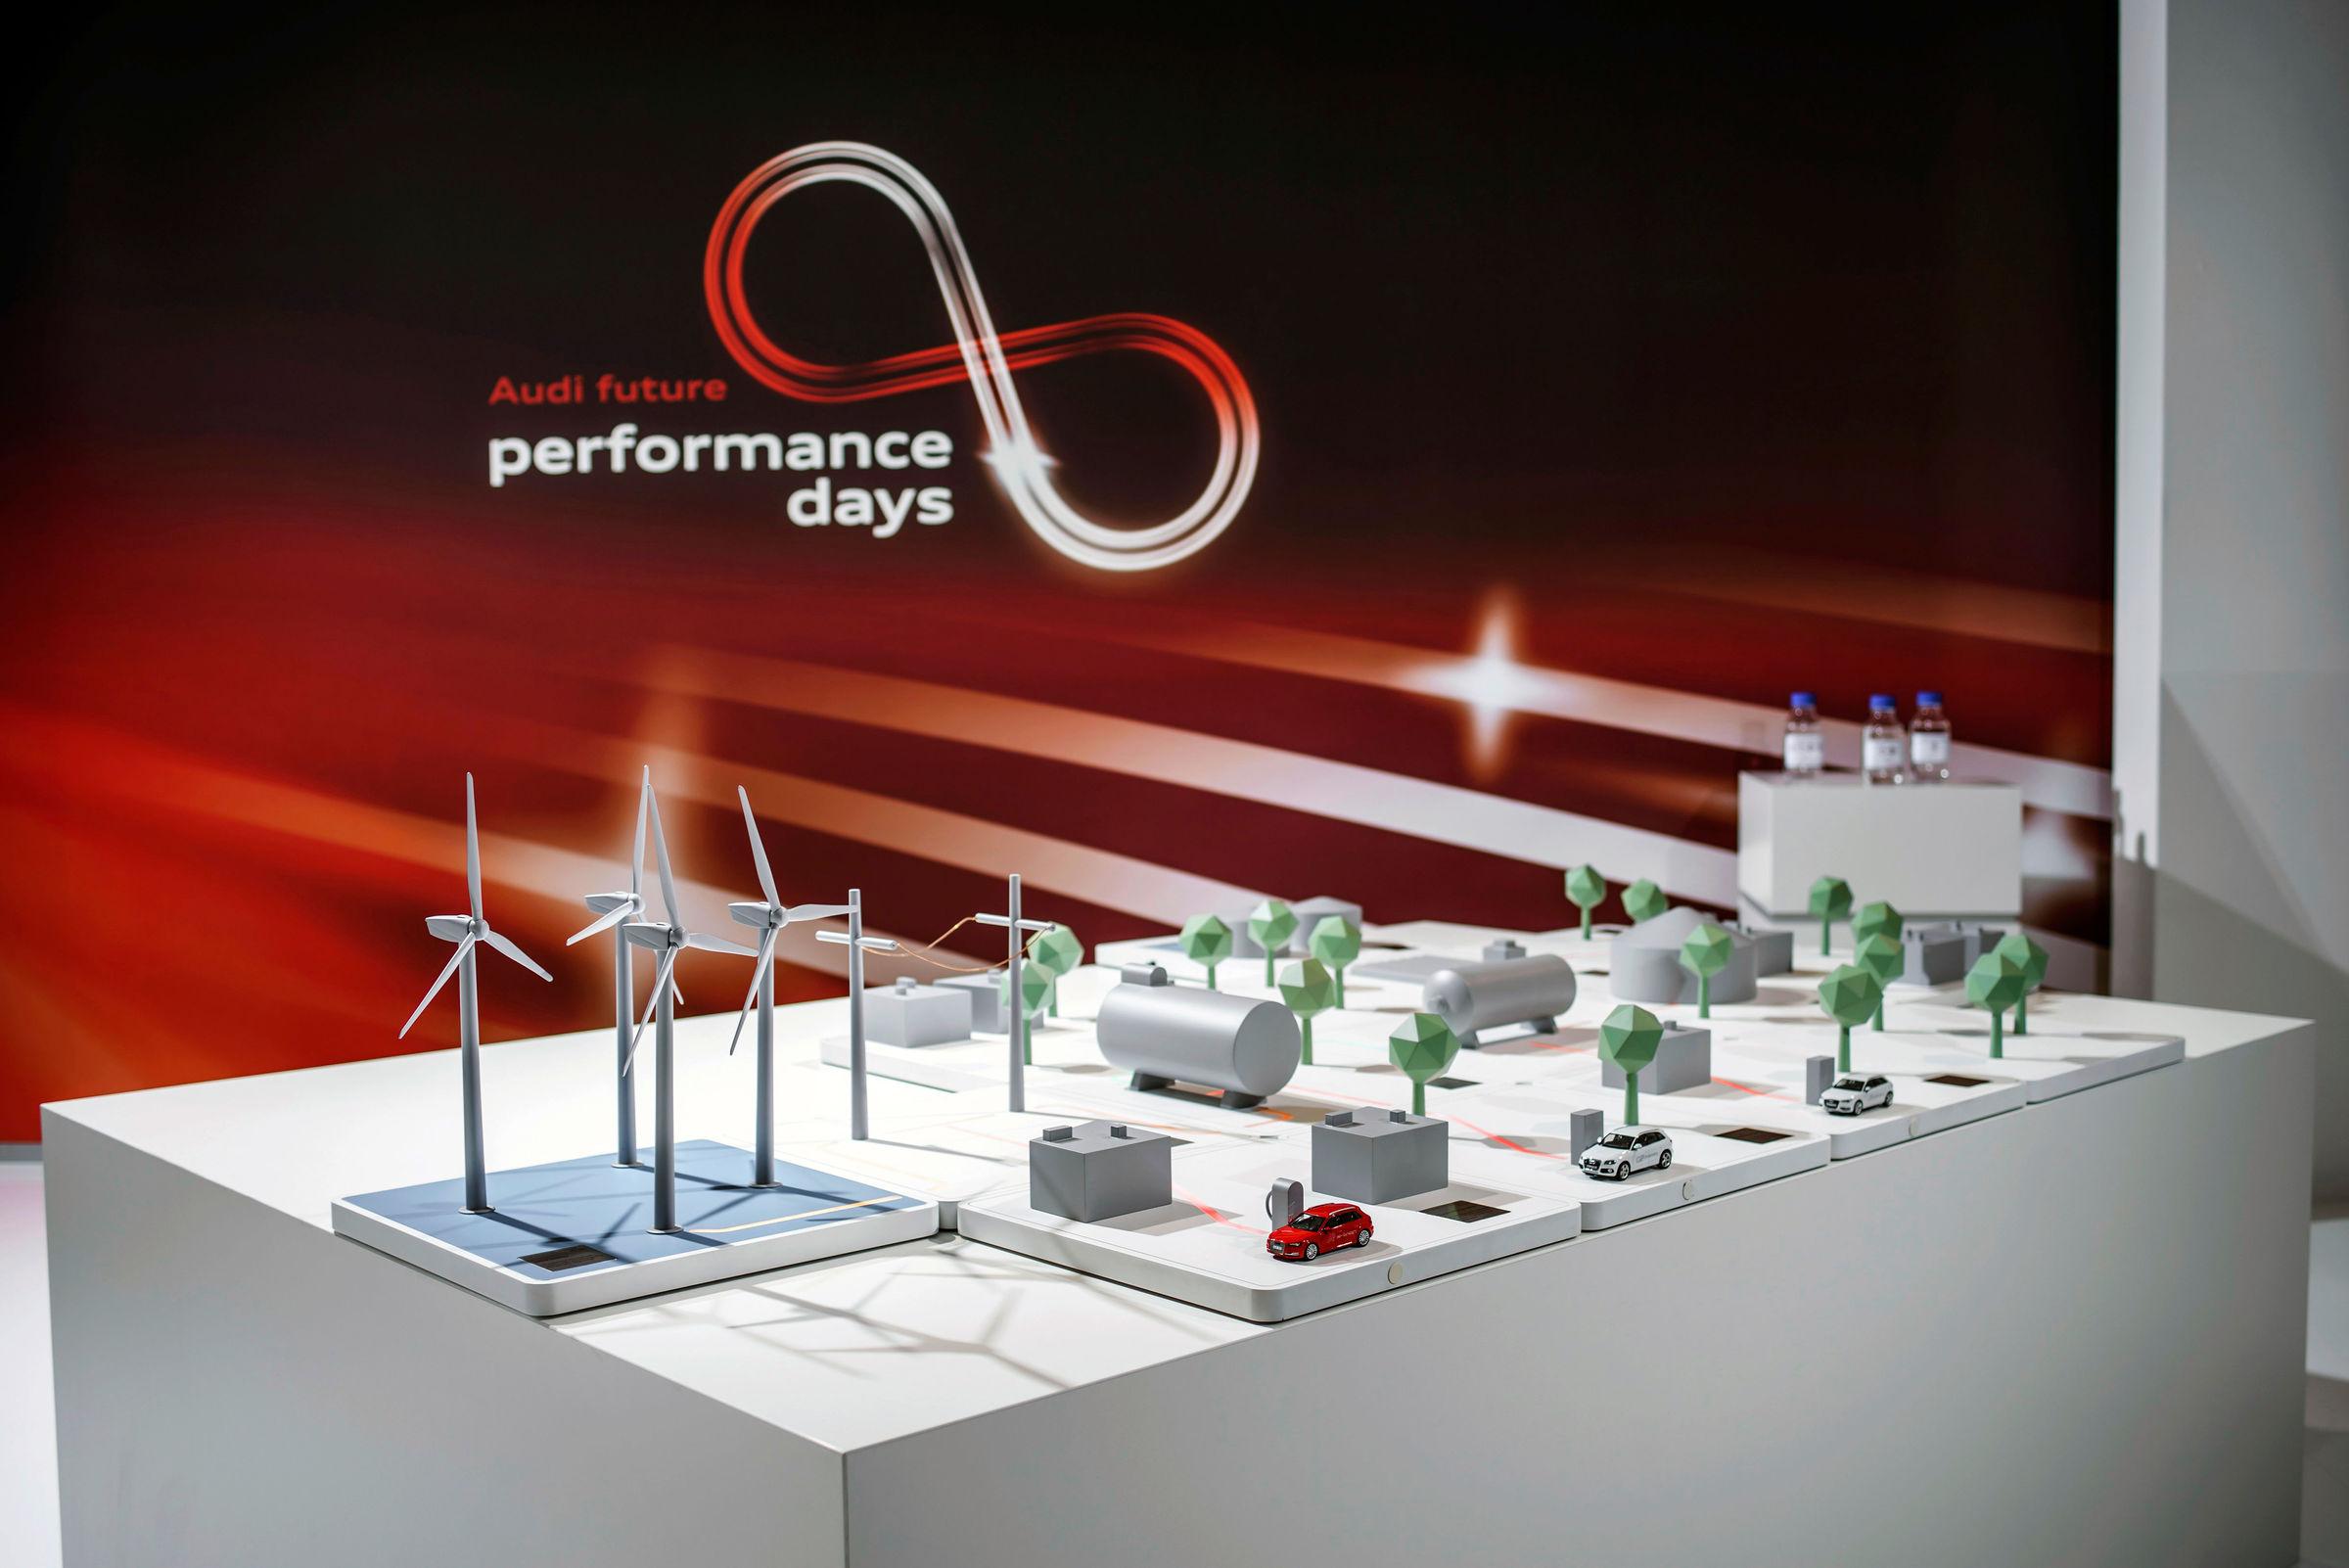 Audi future performance days